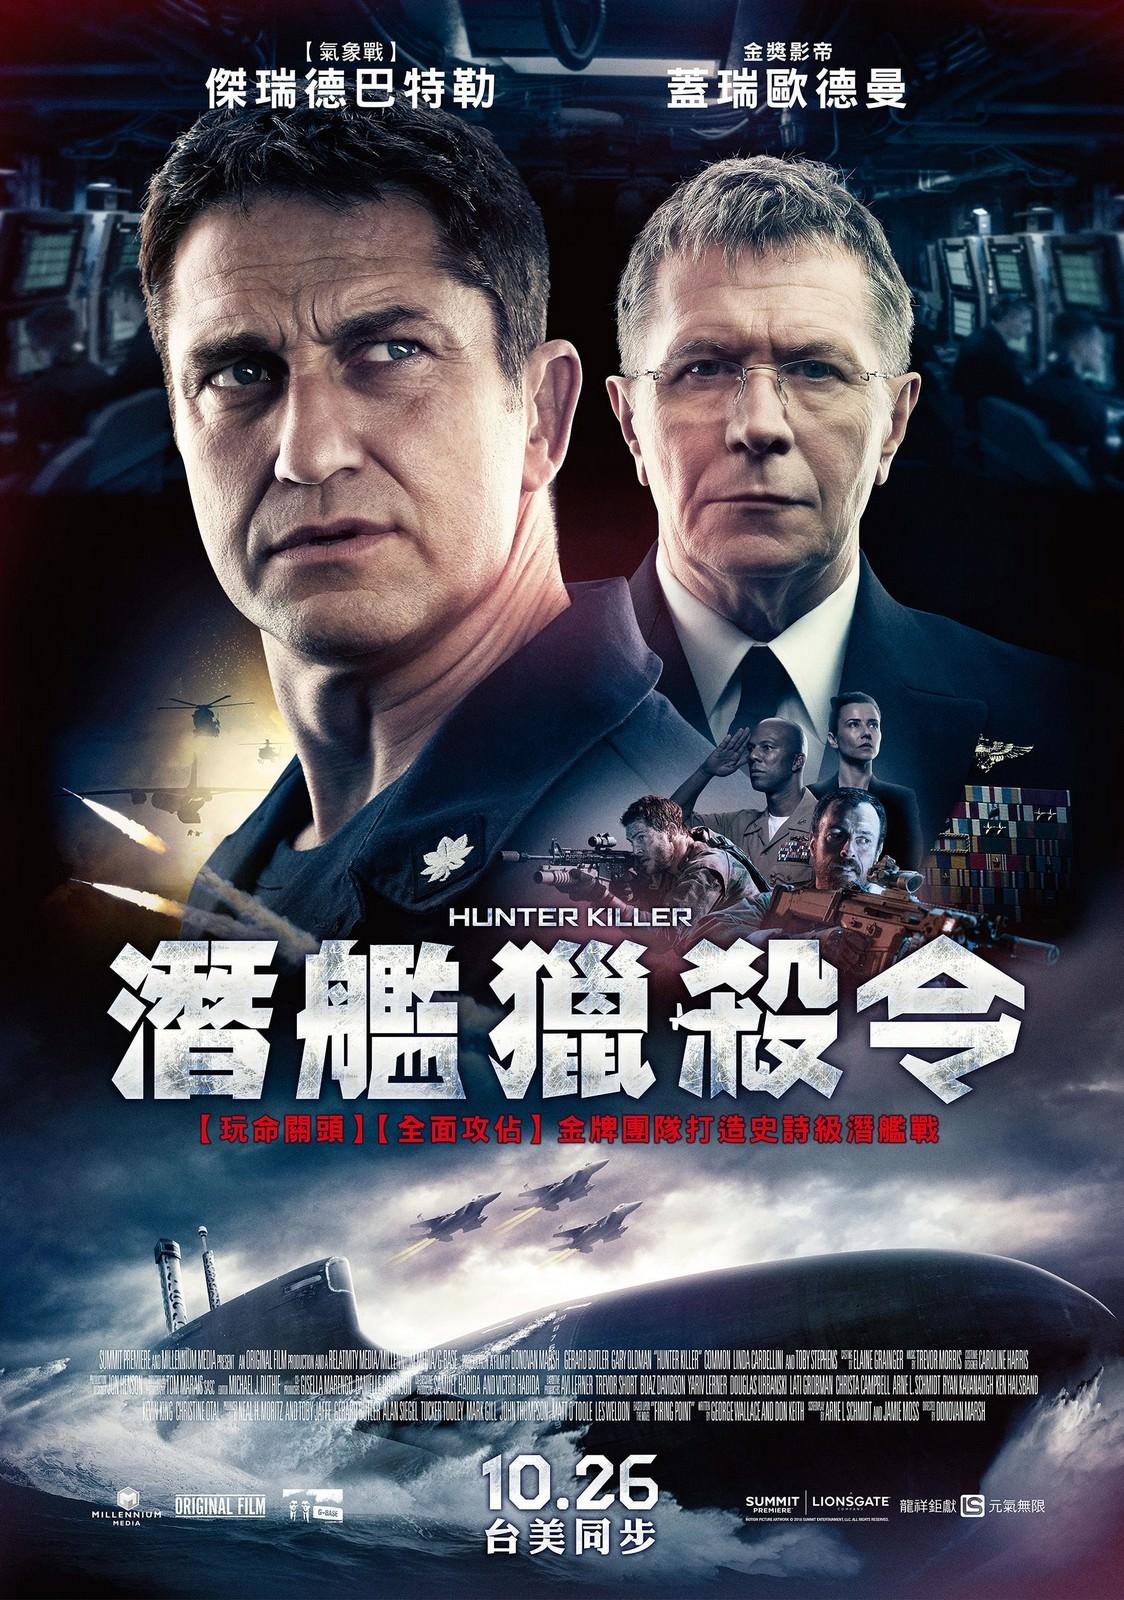 Movie, Hunter Killer(美國, 2018年) / 潛艦獵殺令(台灣) / 冰海陷落(中國) / 潛艦滅殺令(香港), 電影海報, 台灣